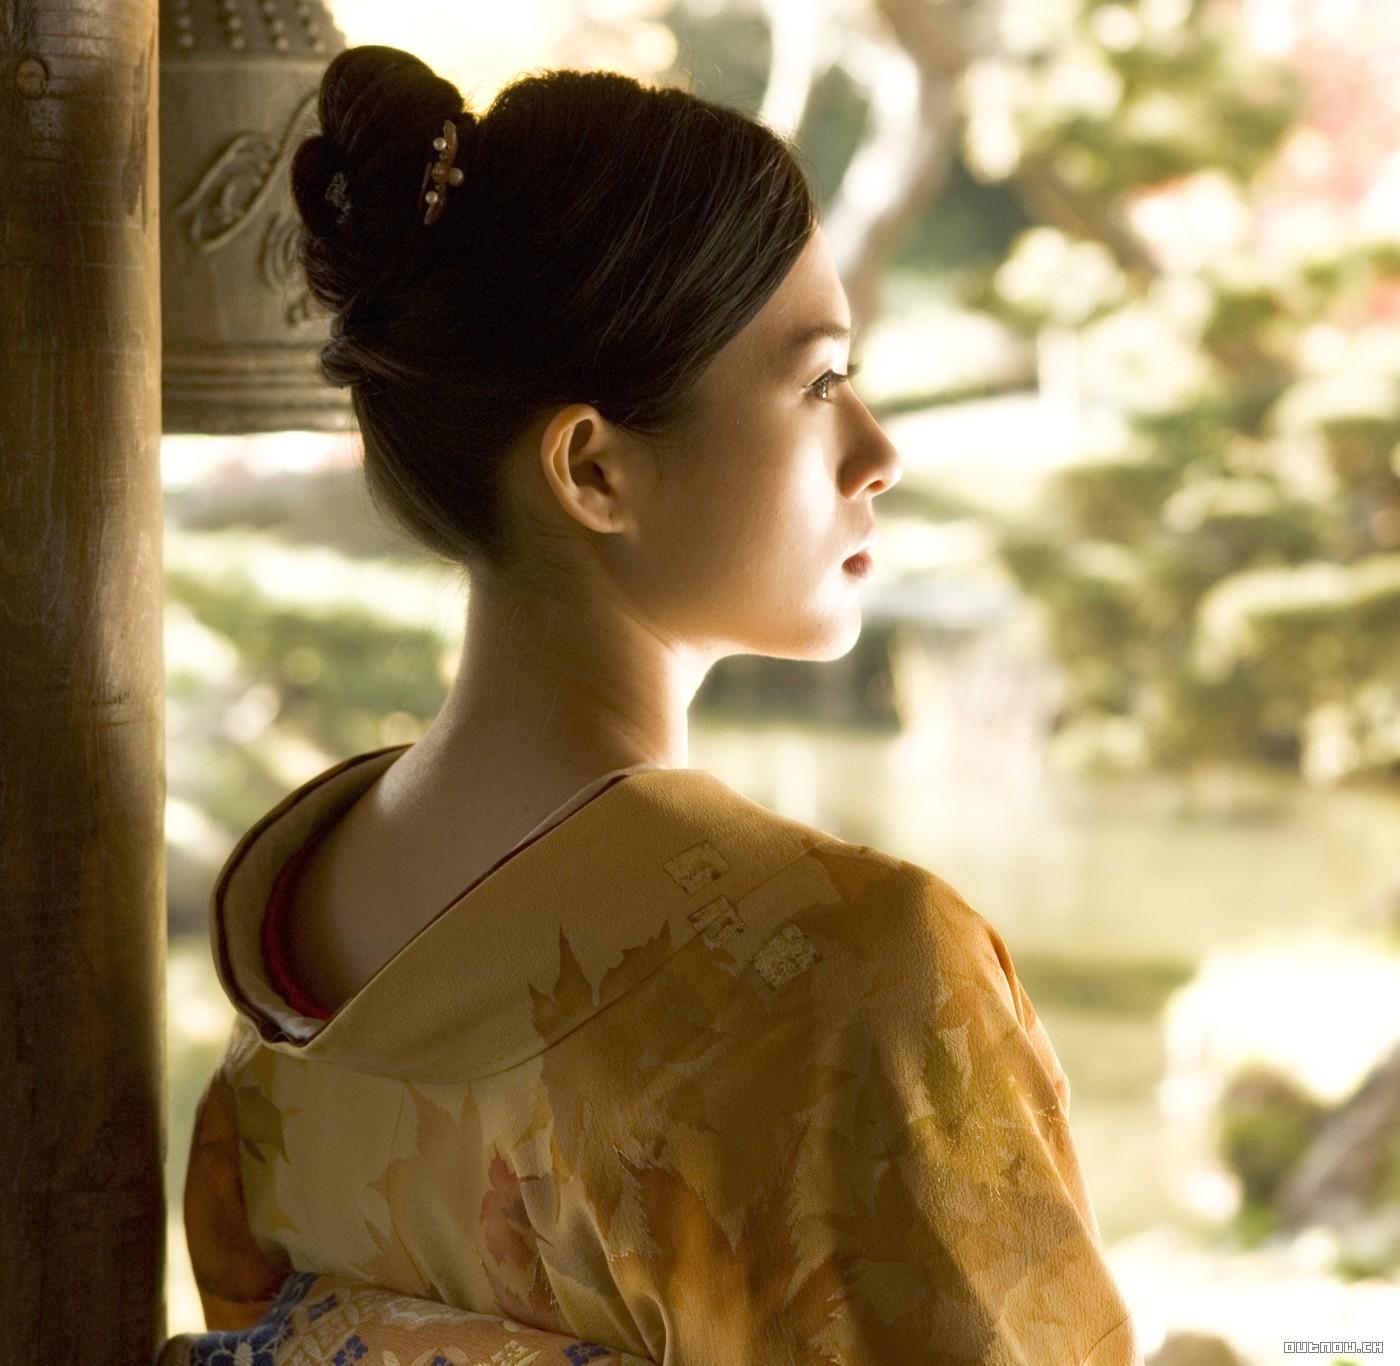 Desi Girl Image Wallpaper Voyage To Springtime Memoirs Of A Geisha